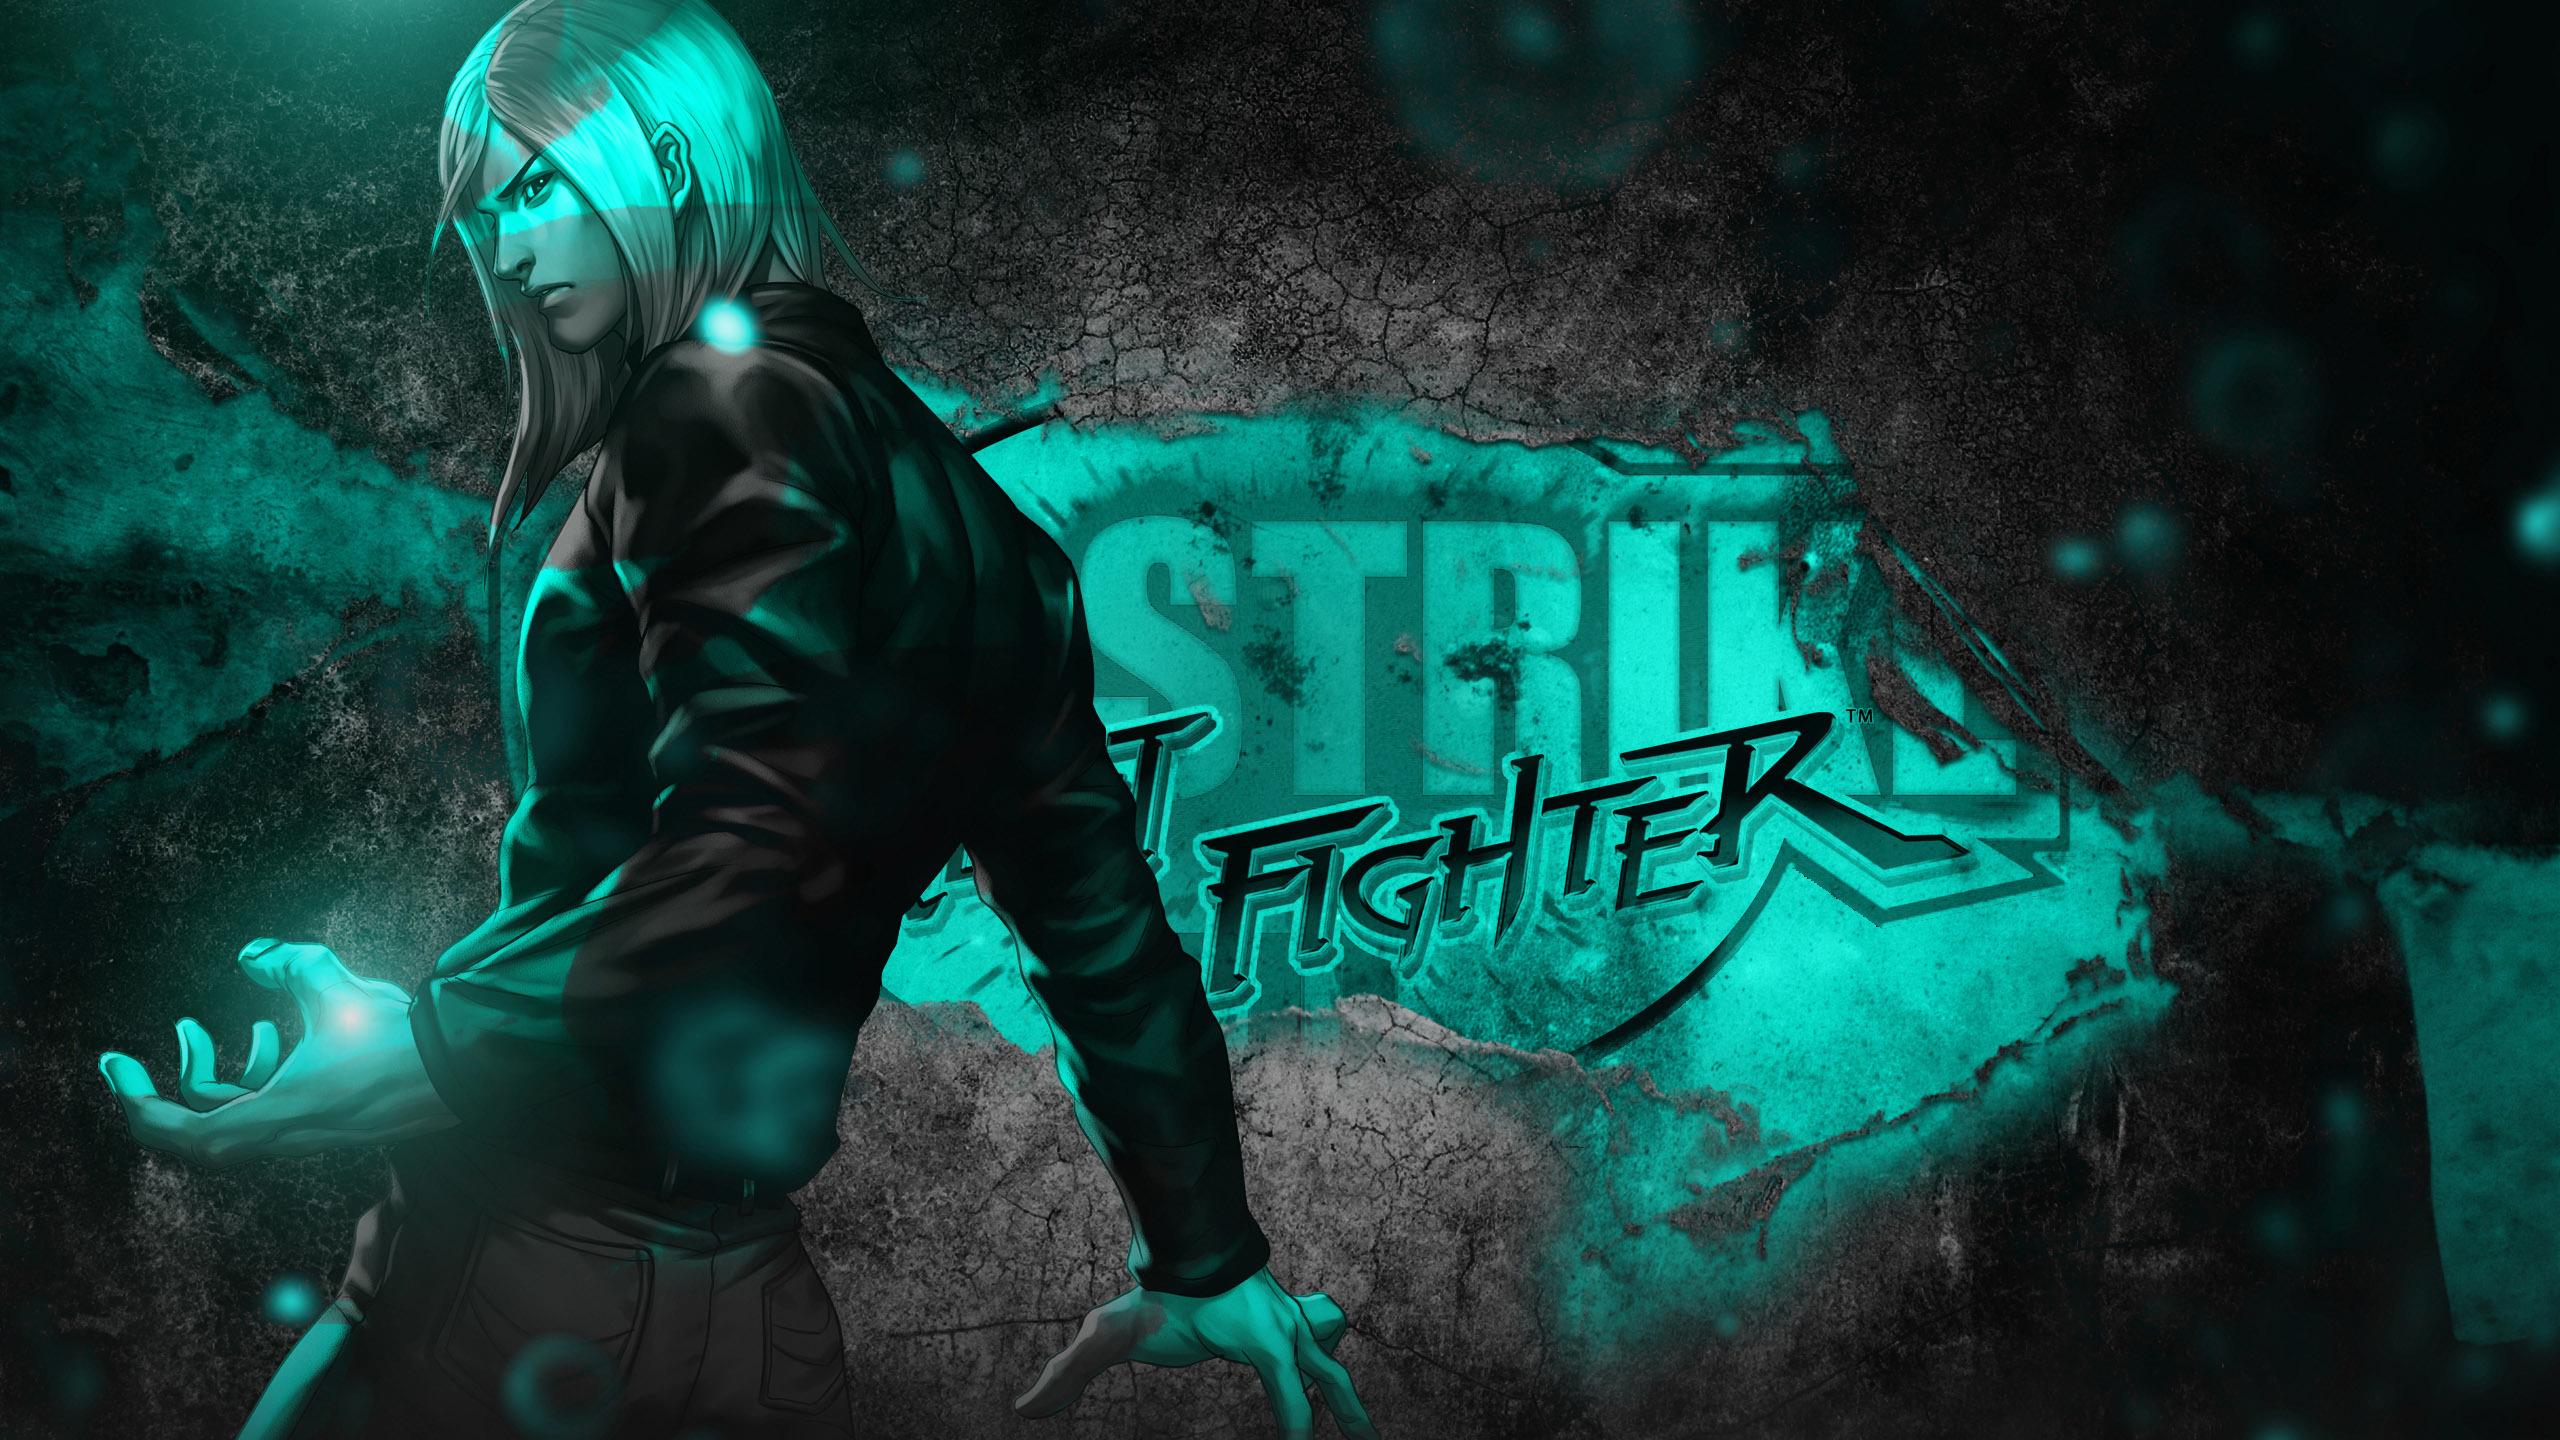 Street Fighter 3 Wallpaper